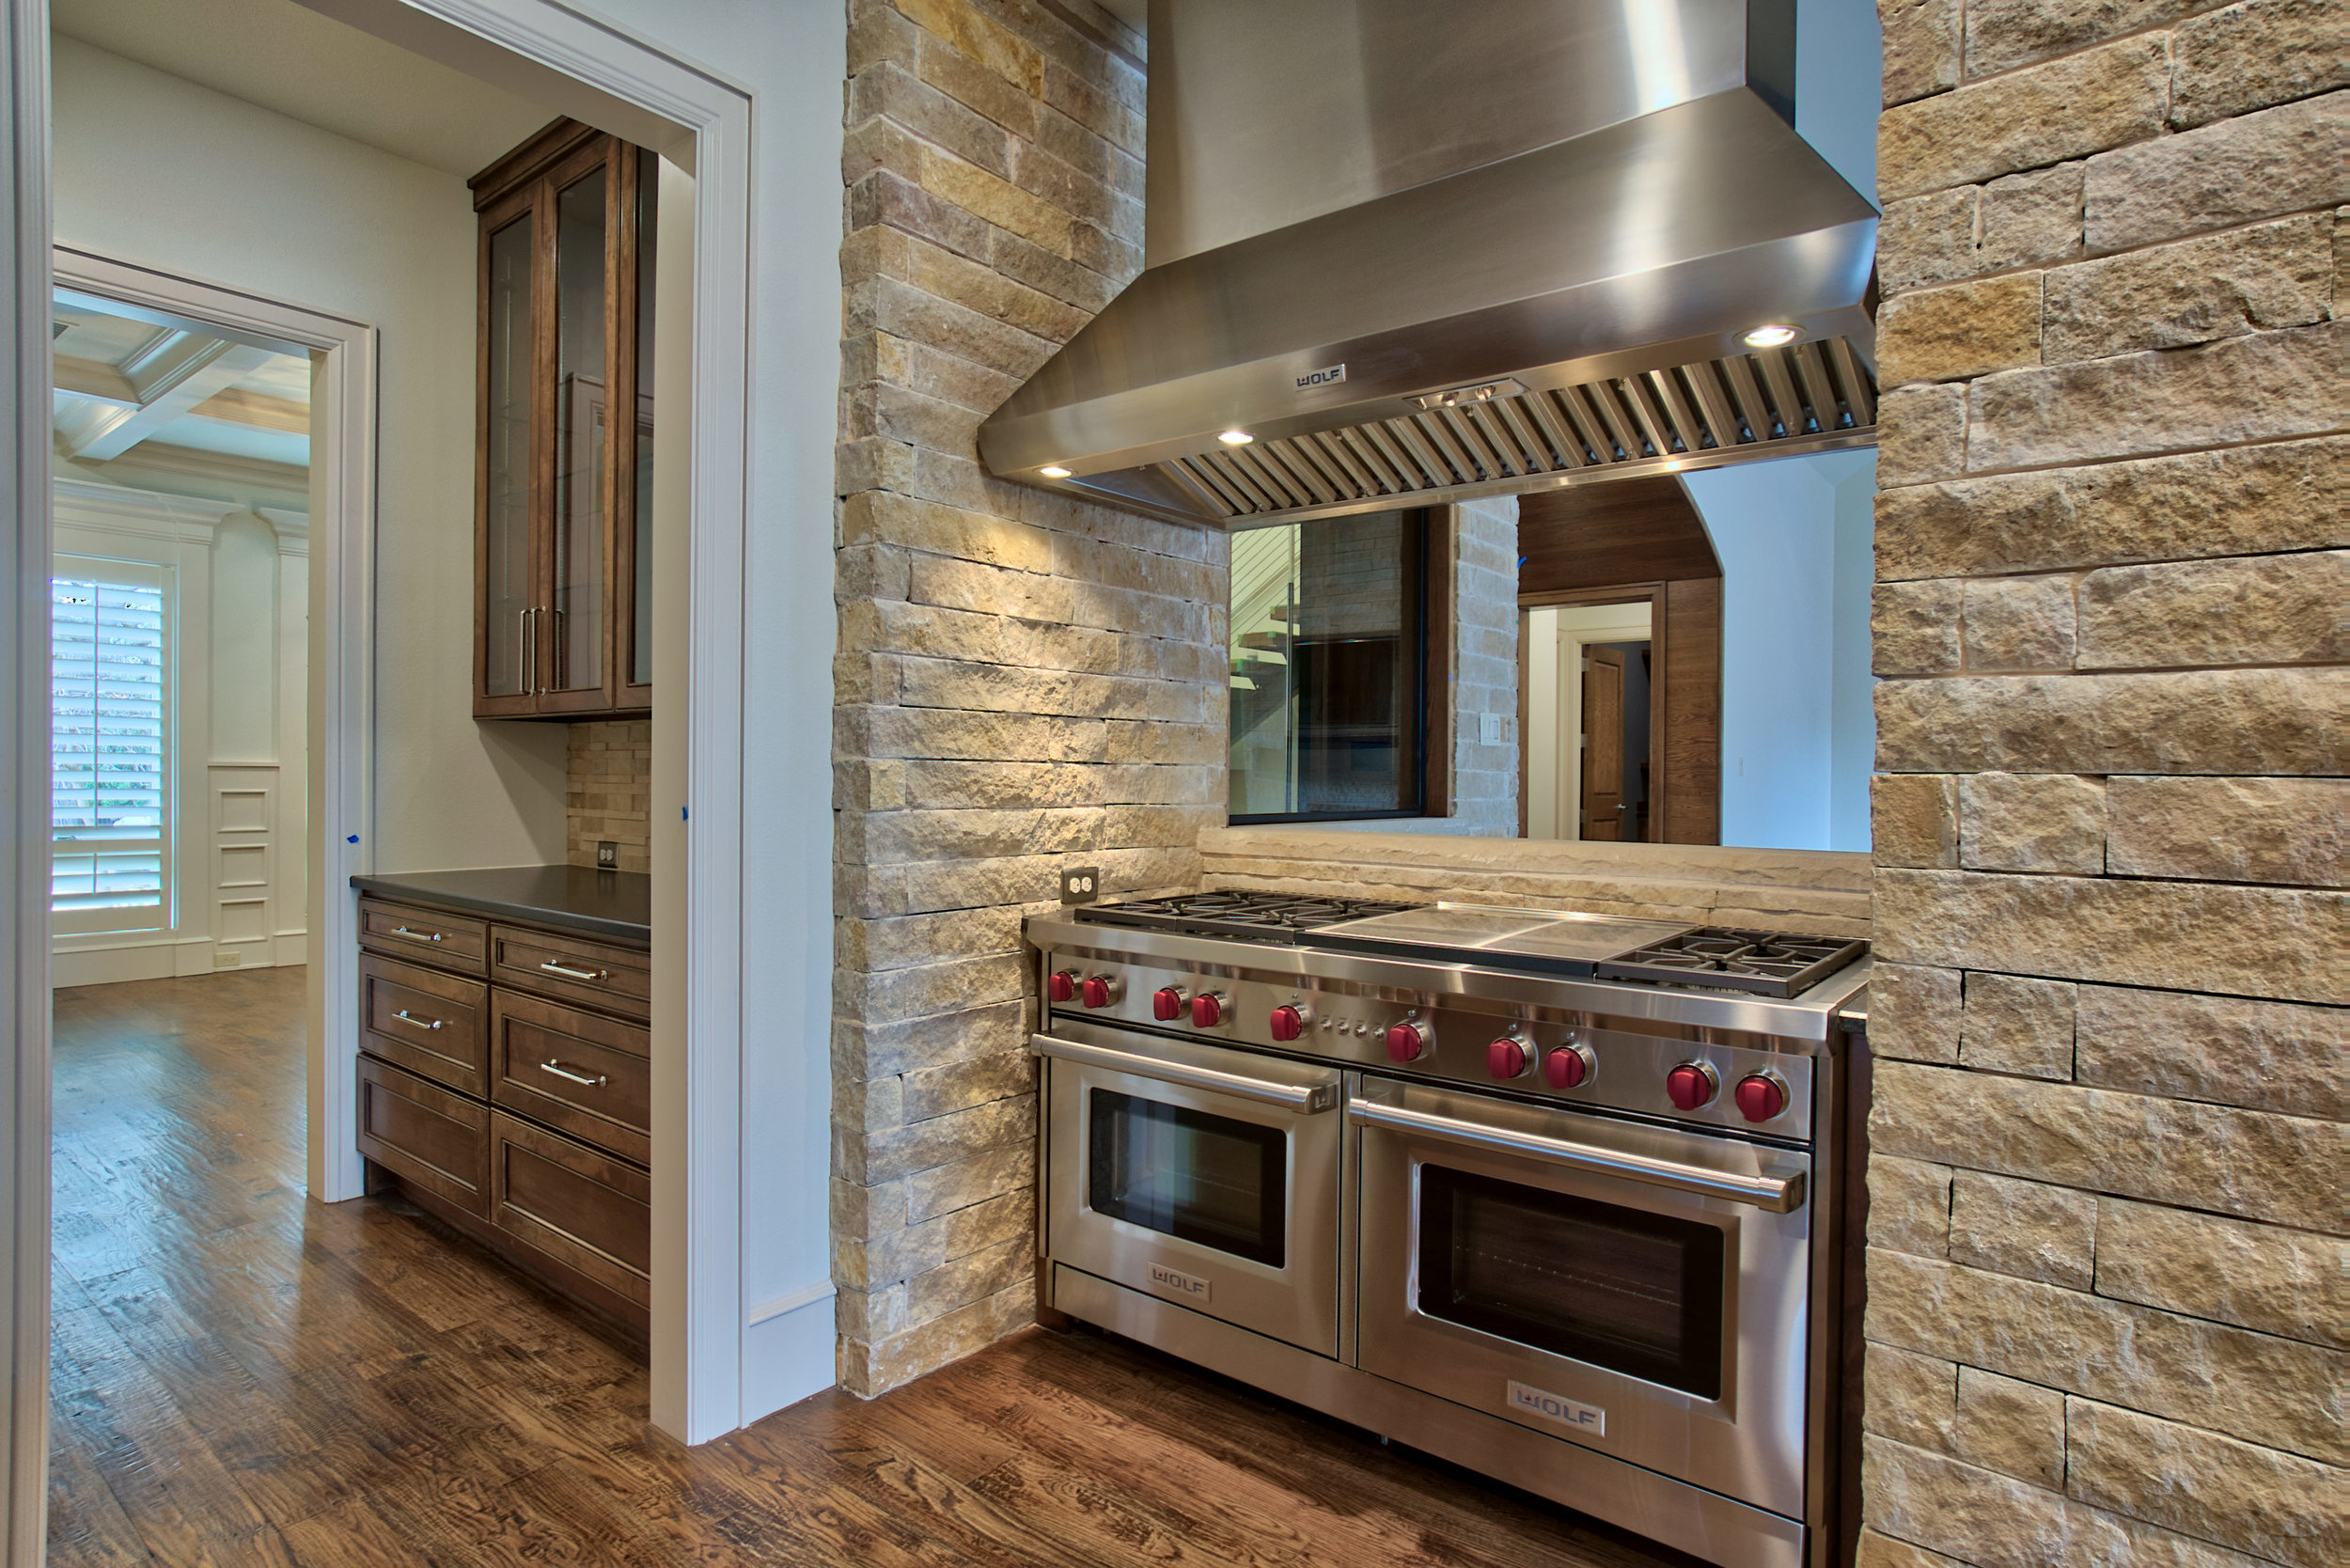 12 kitchen 5.jpeg